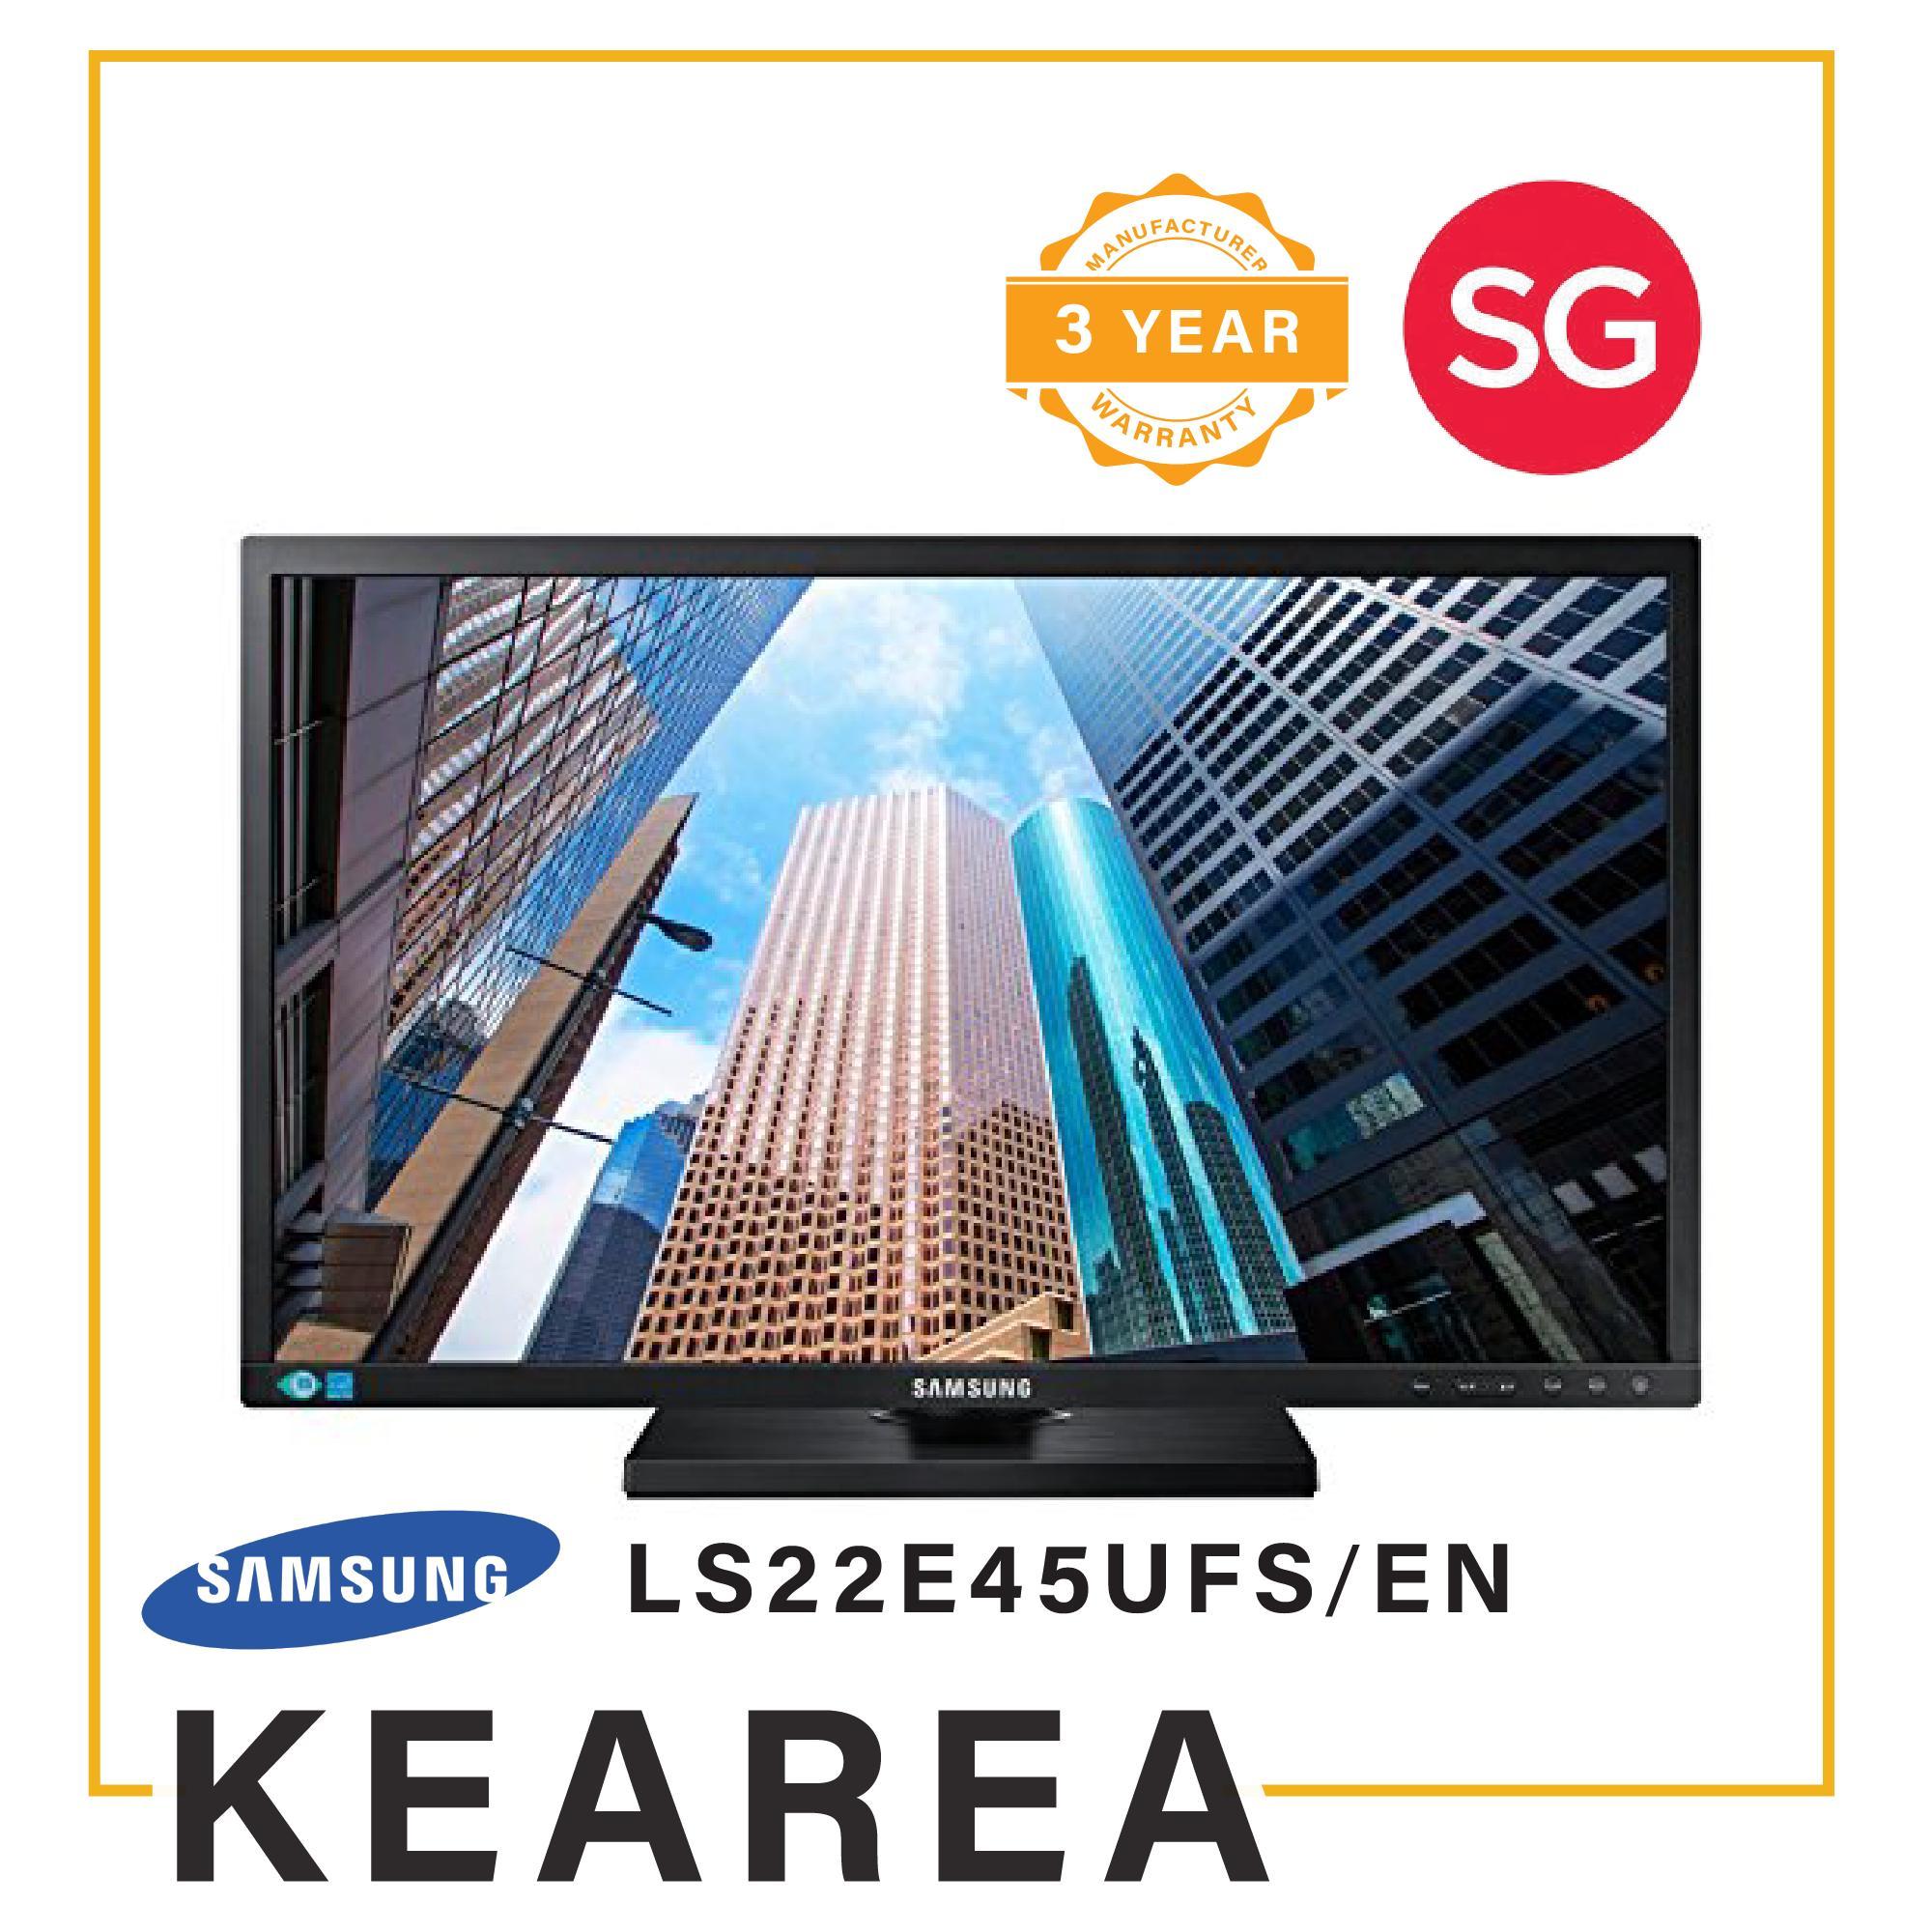 Samsung LS22E45UFS/EN Computer Monitor (Local Manufacturer Warranty - 3 Years)